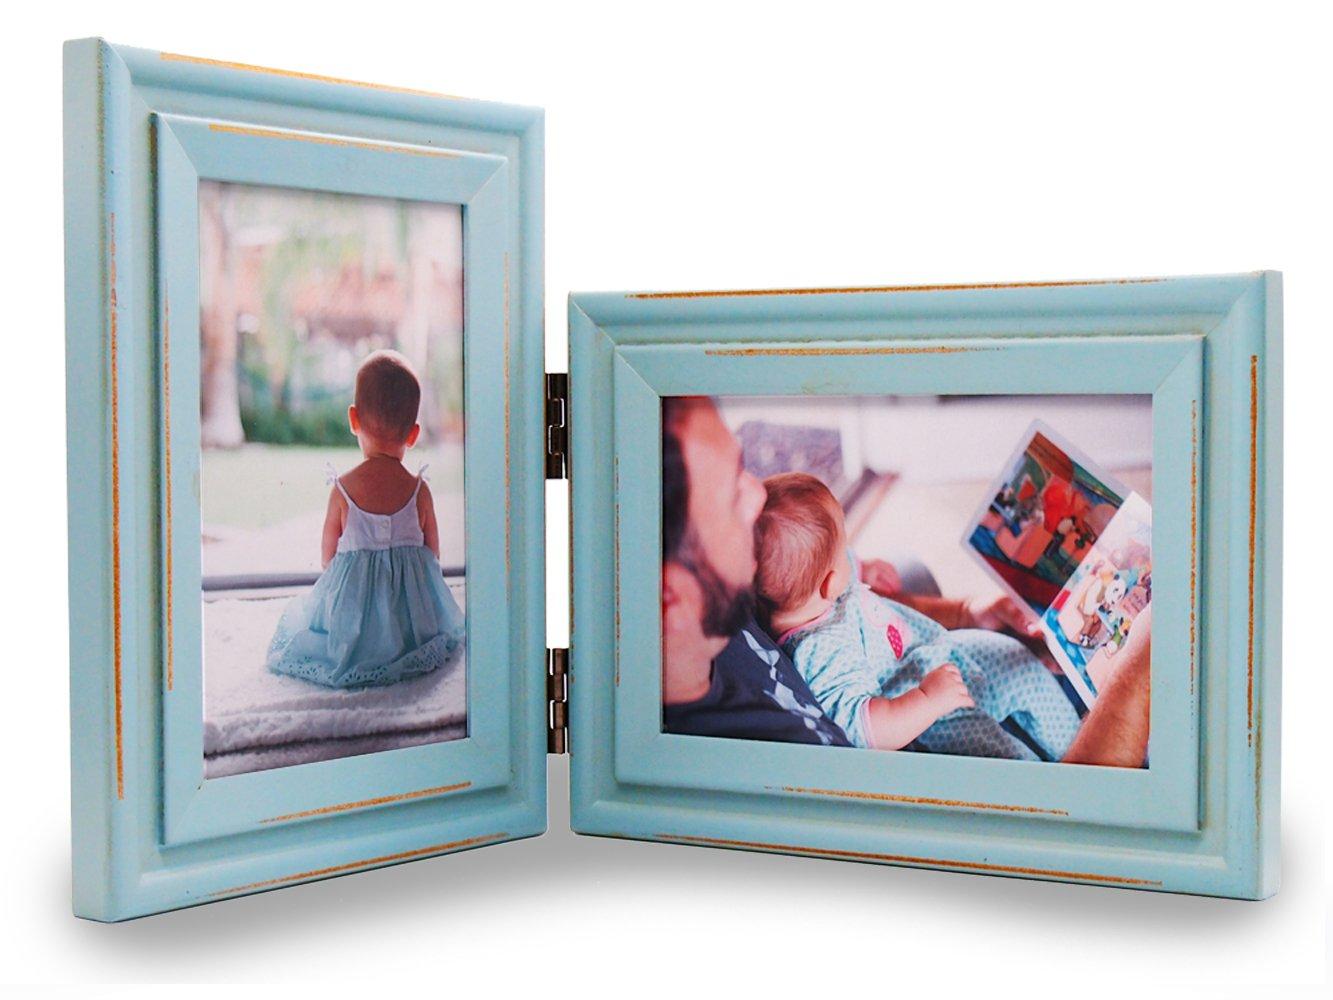 Amazon.com: CECIINION Wood Folding Photo Frame Triple Duplex Hinged ...